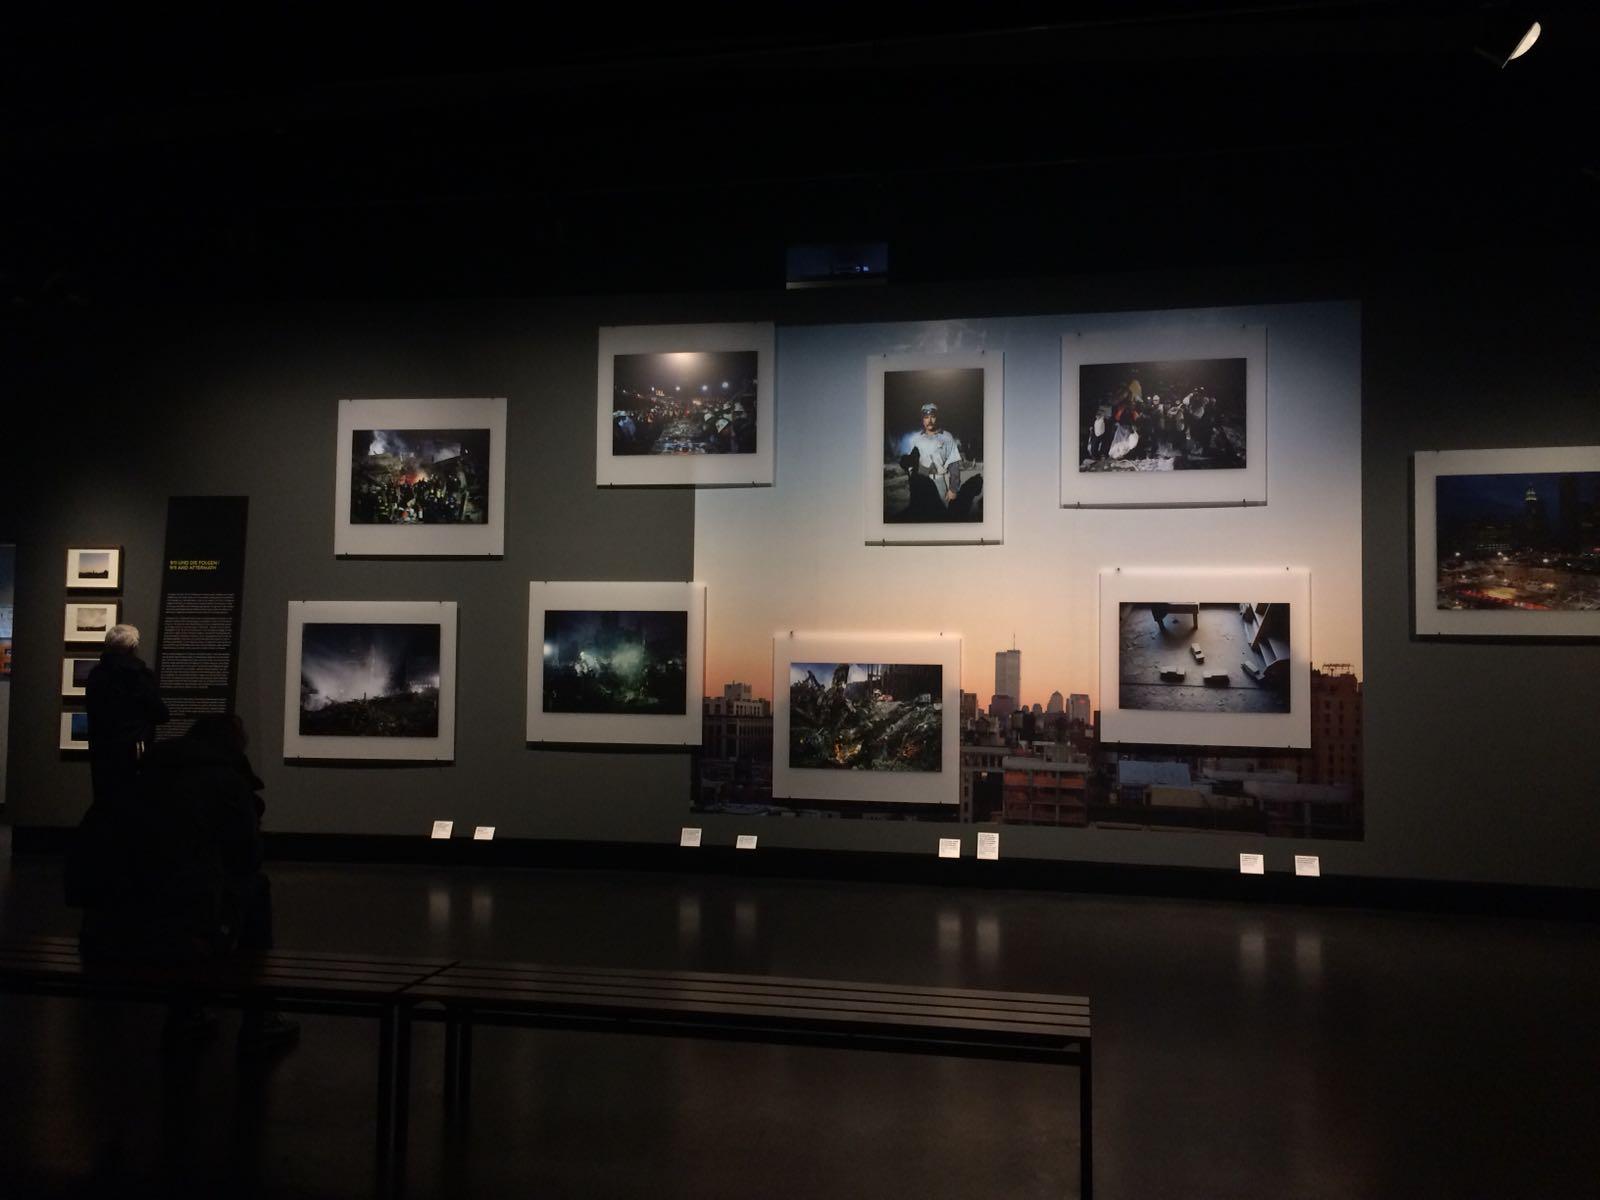 Semi Zine reviews the Joel Meyerowitz retrospective at C/O Berlin, curated by Felix Hoffman.